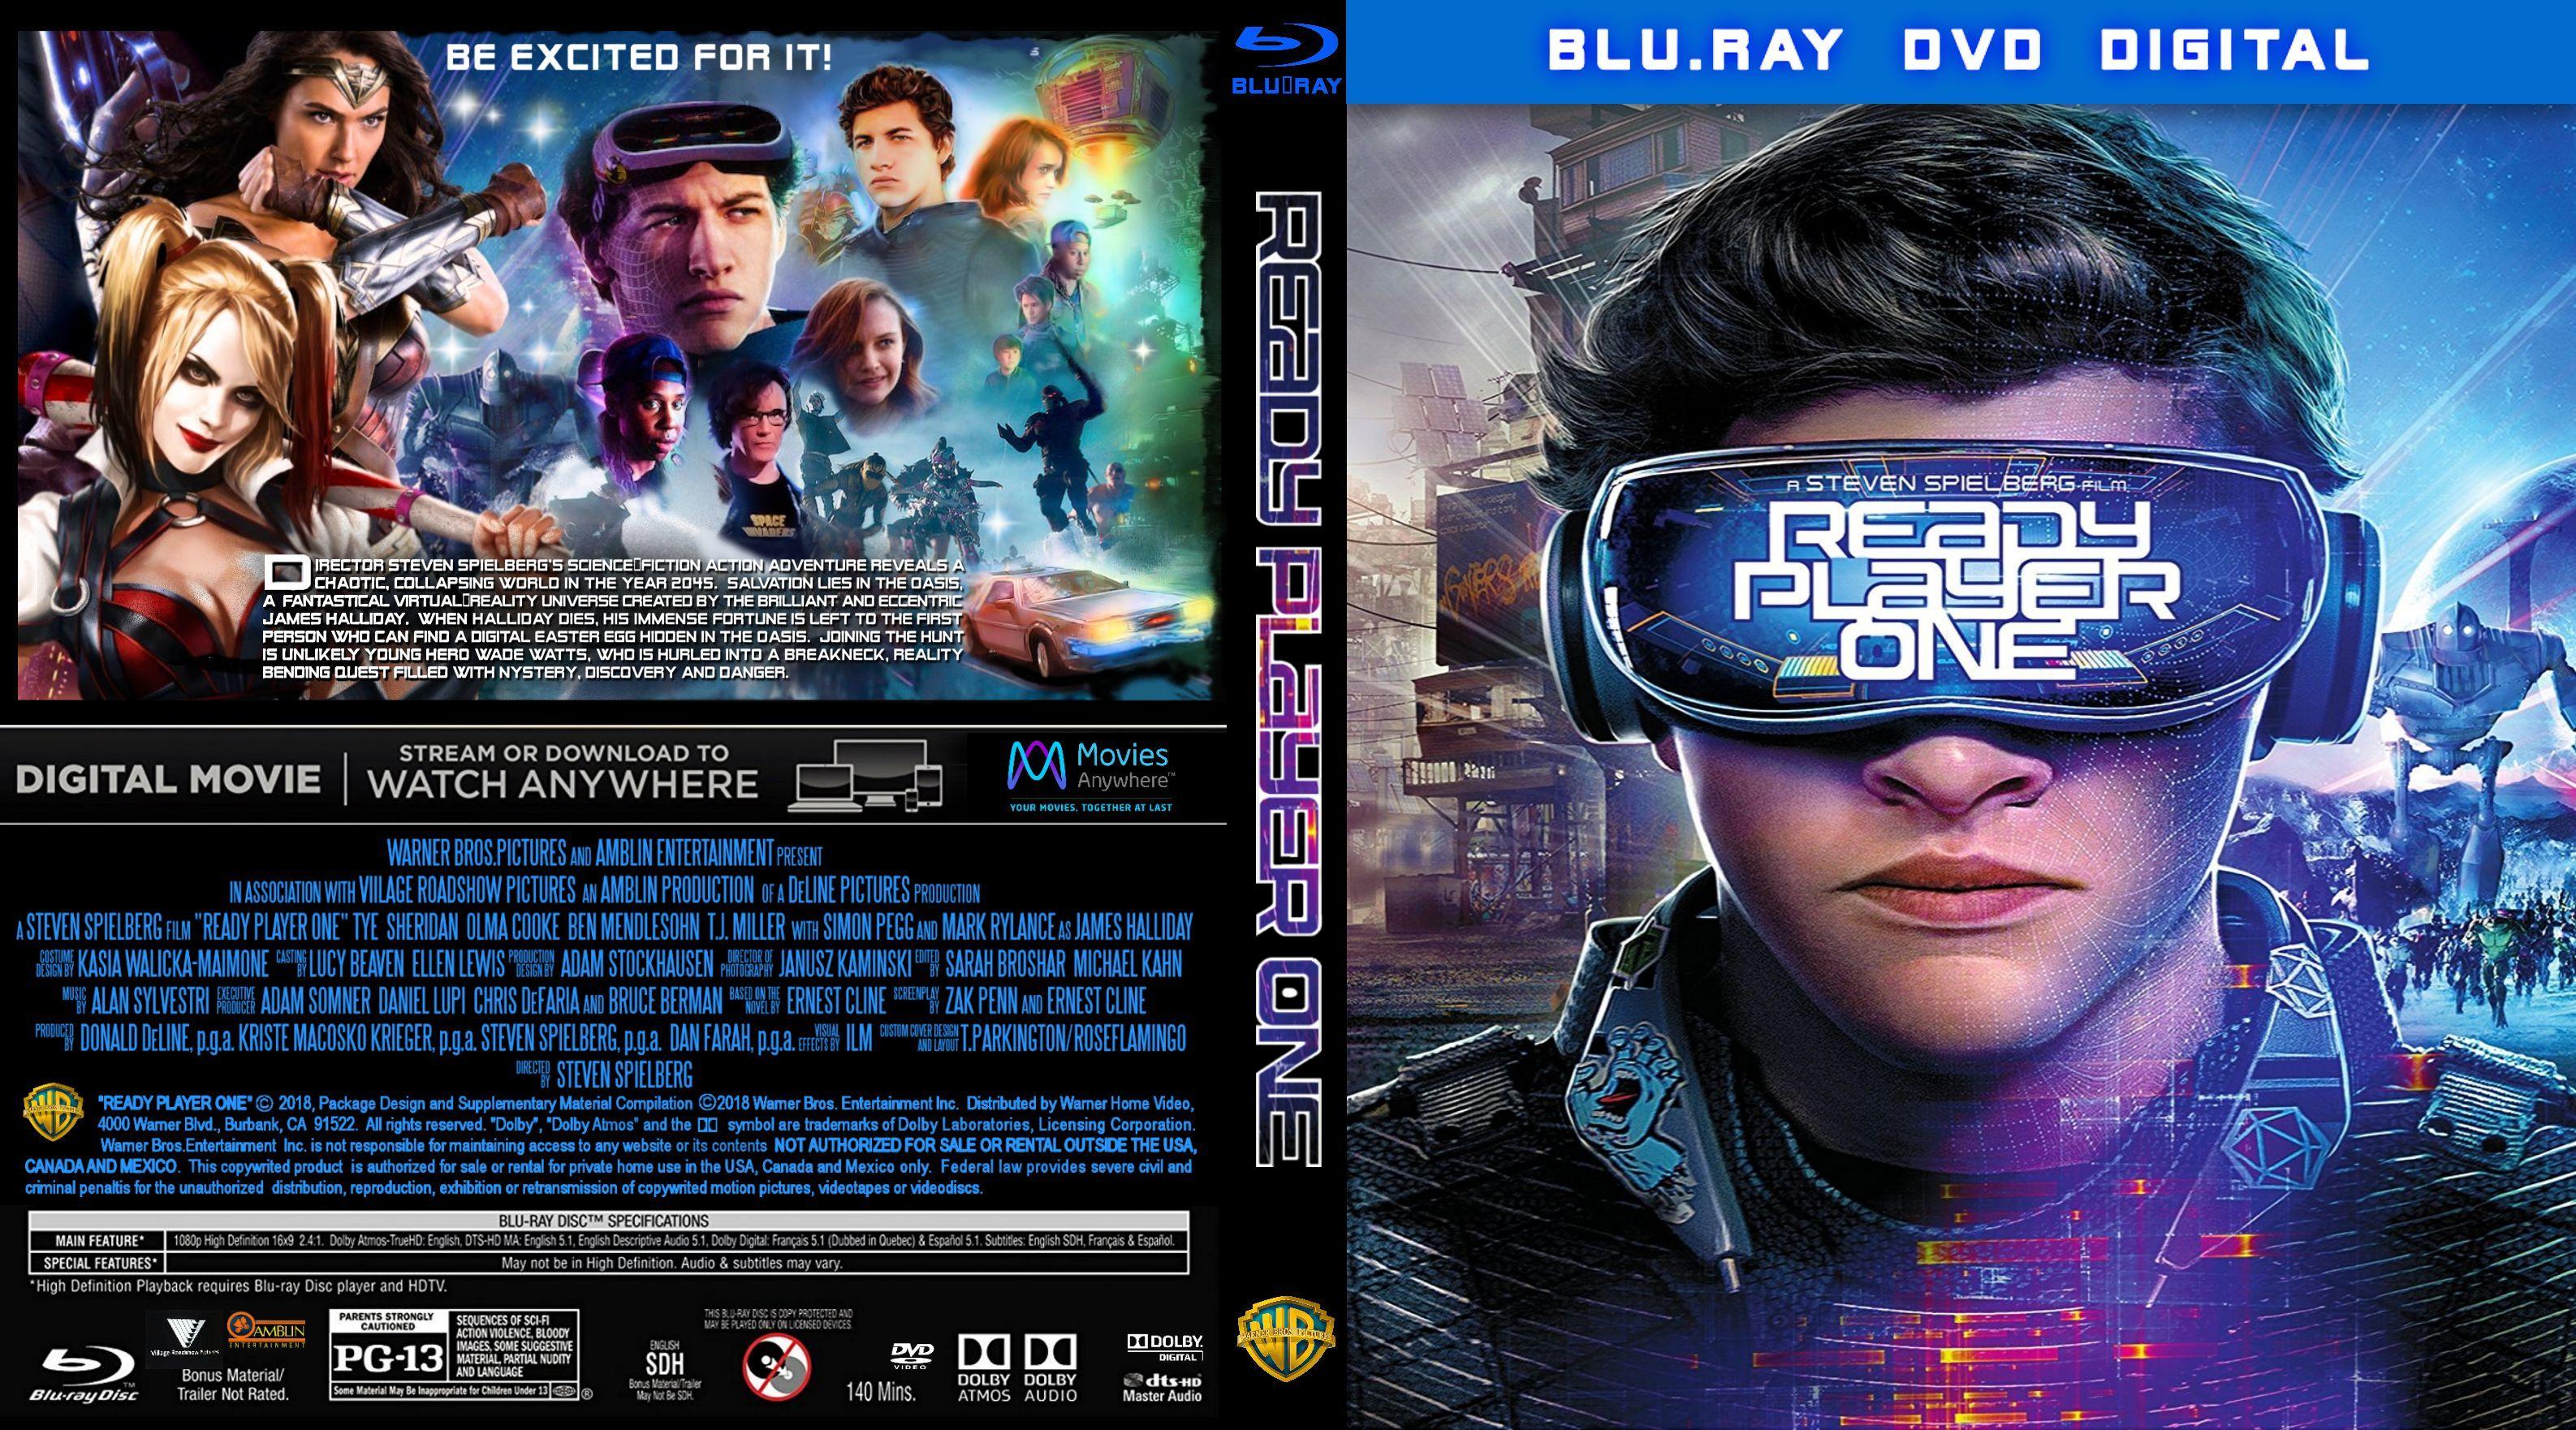 Ready Player One (2018) (2160p BluRay x265 HEVC 10bit HDR